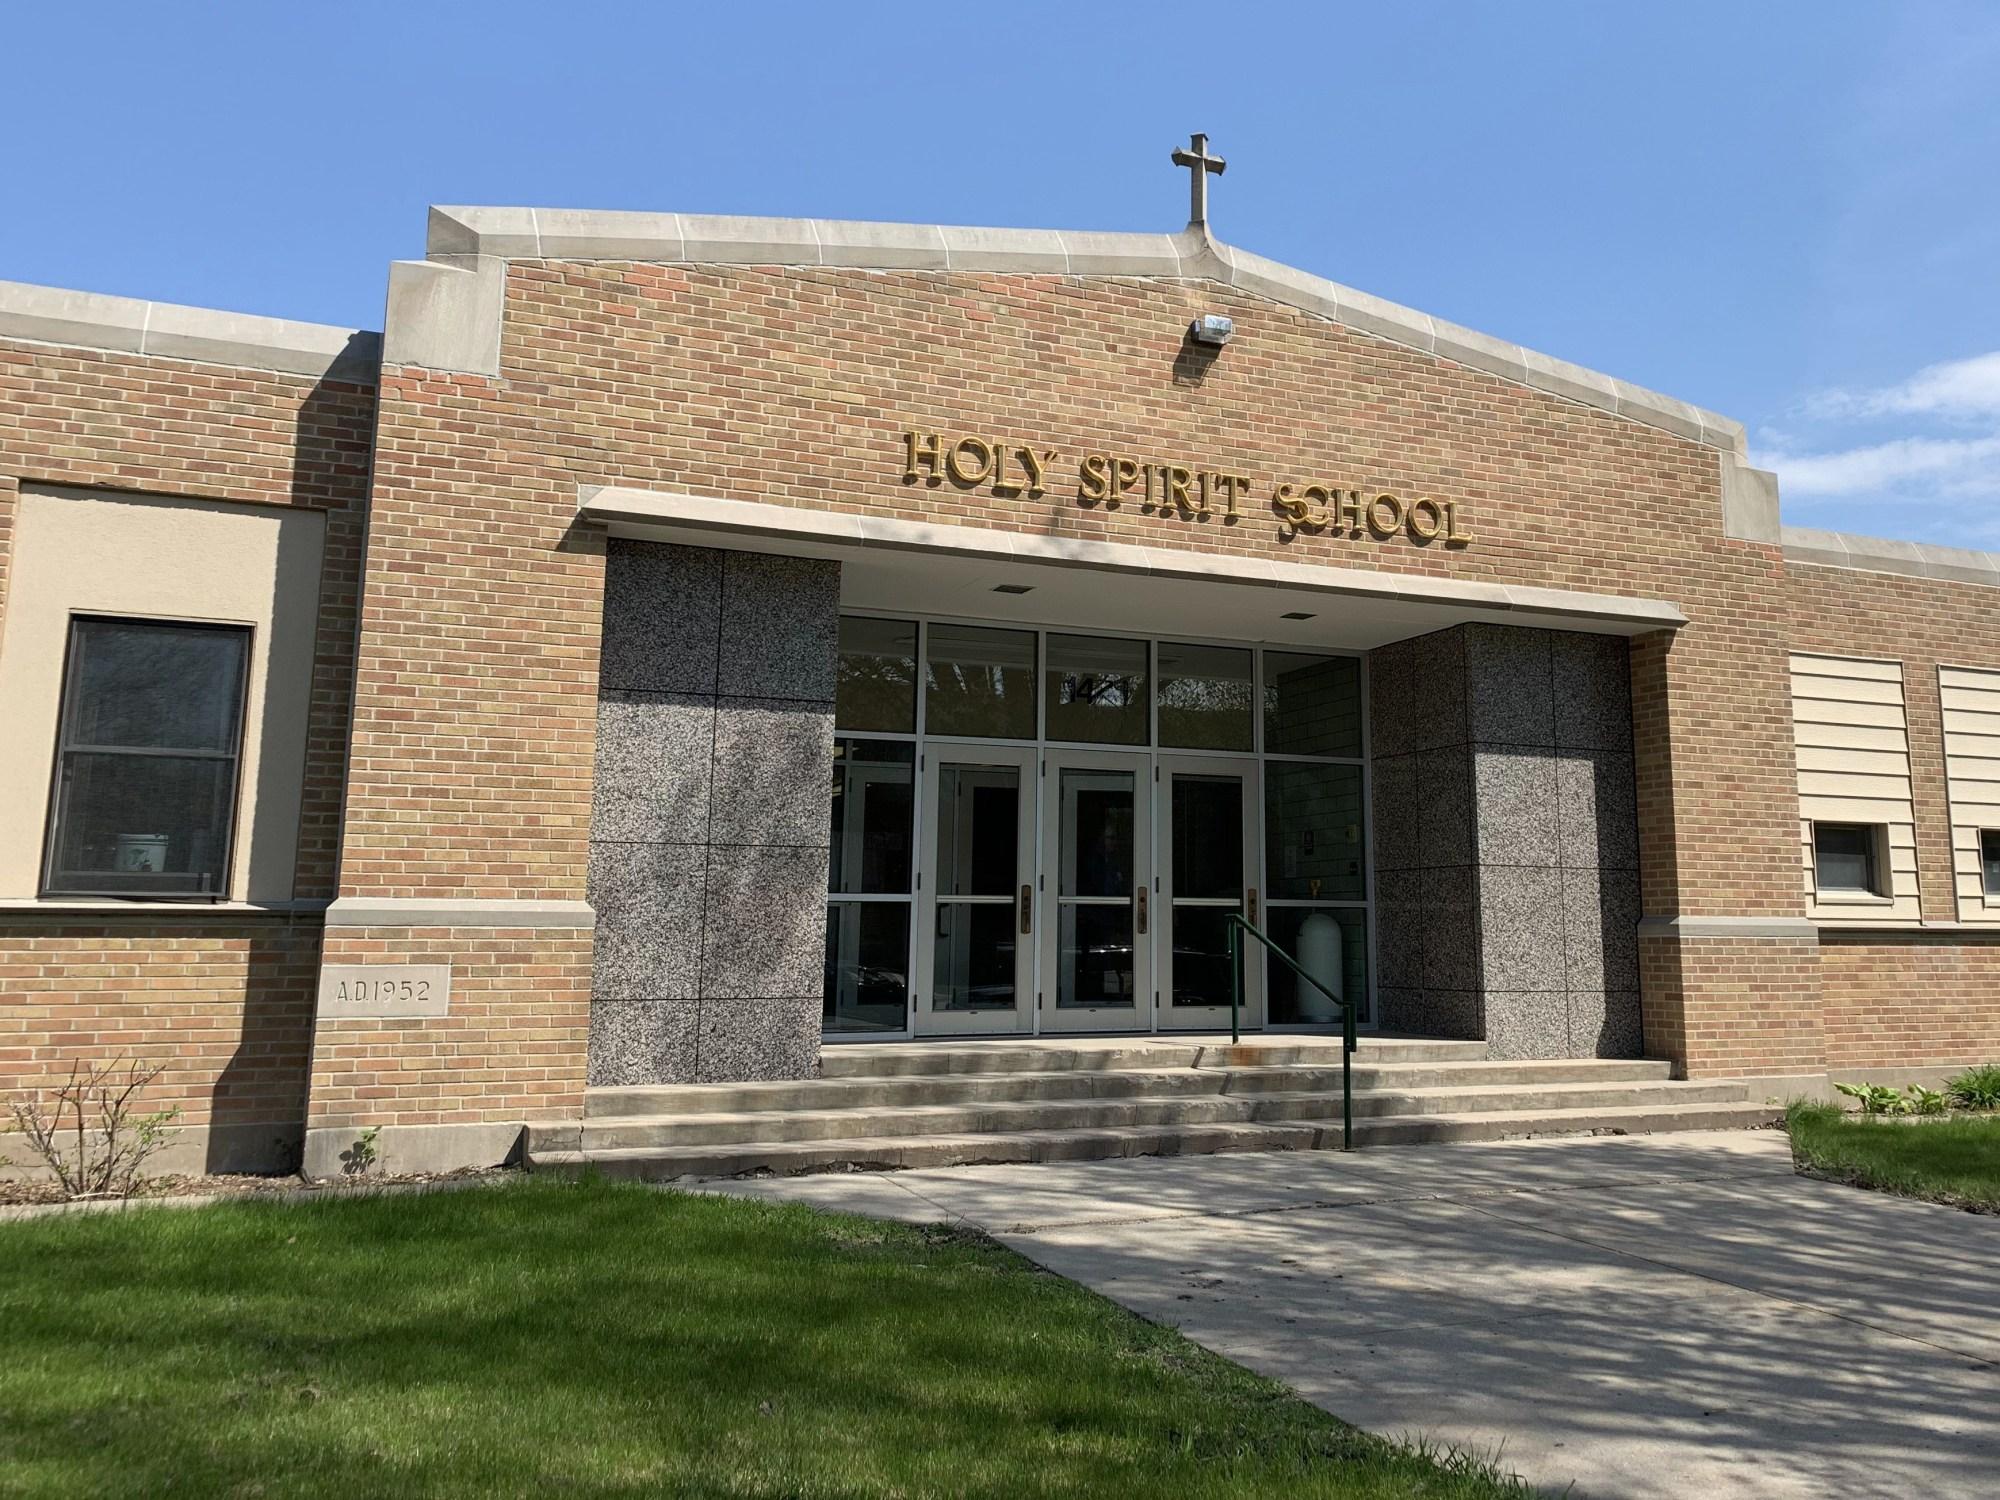 hight resolution of Holy Spirit Elementary :: Fargo-Moorhead Metro COG